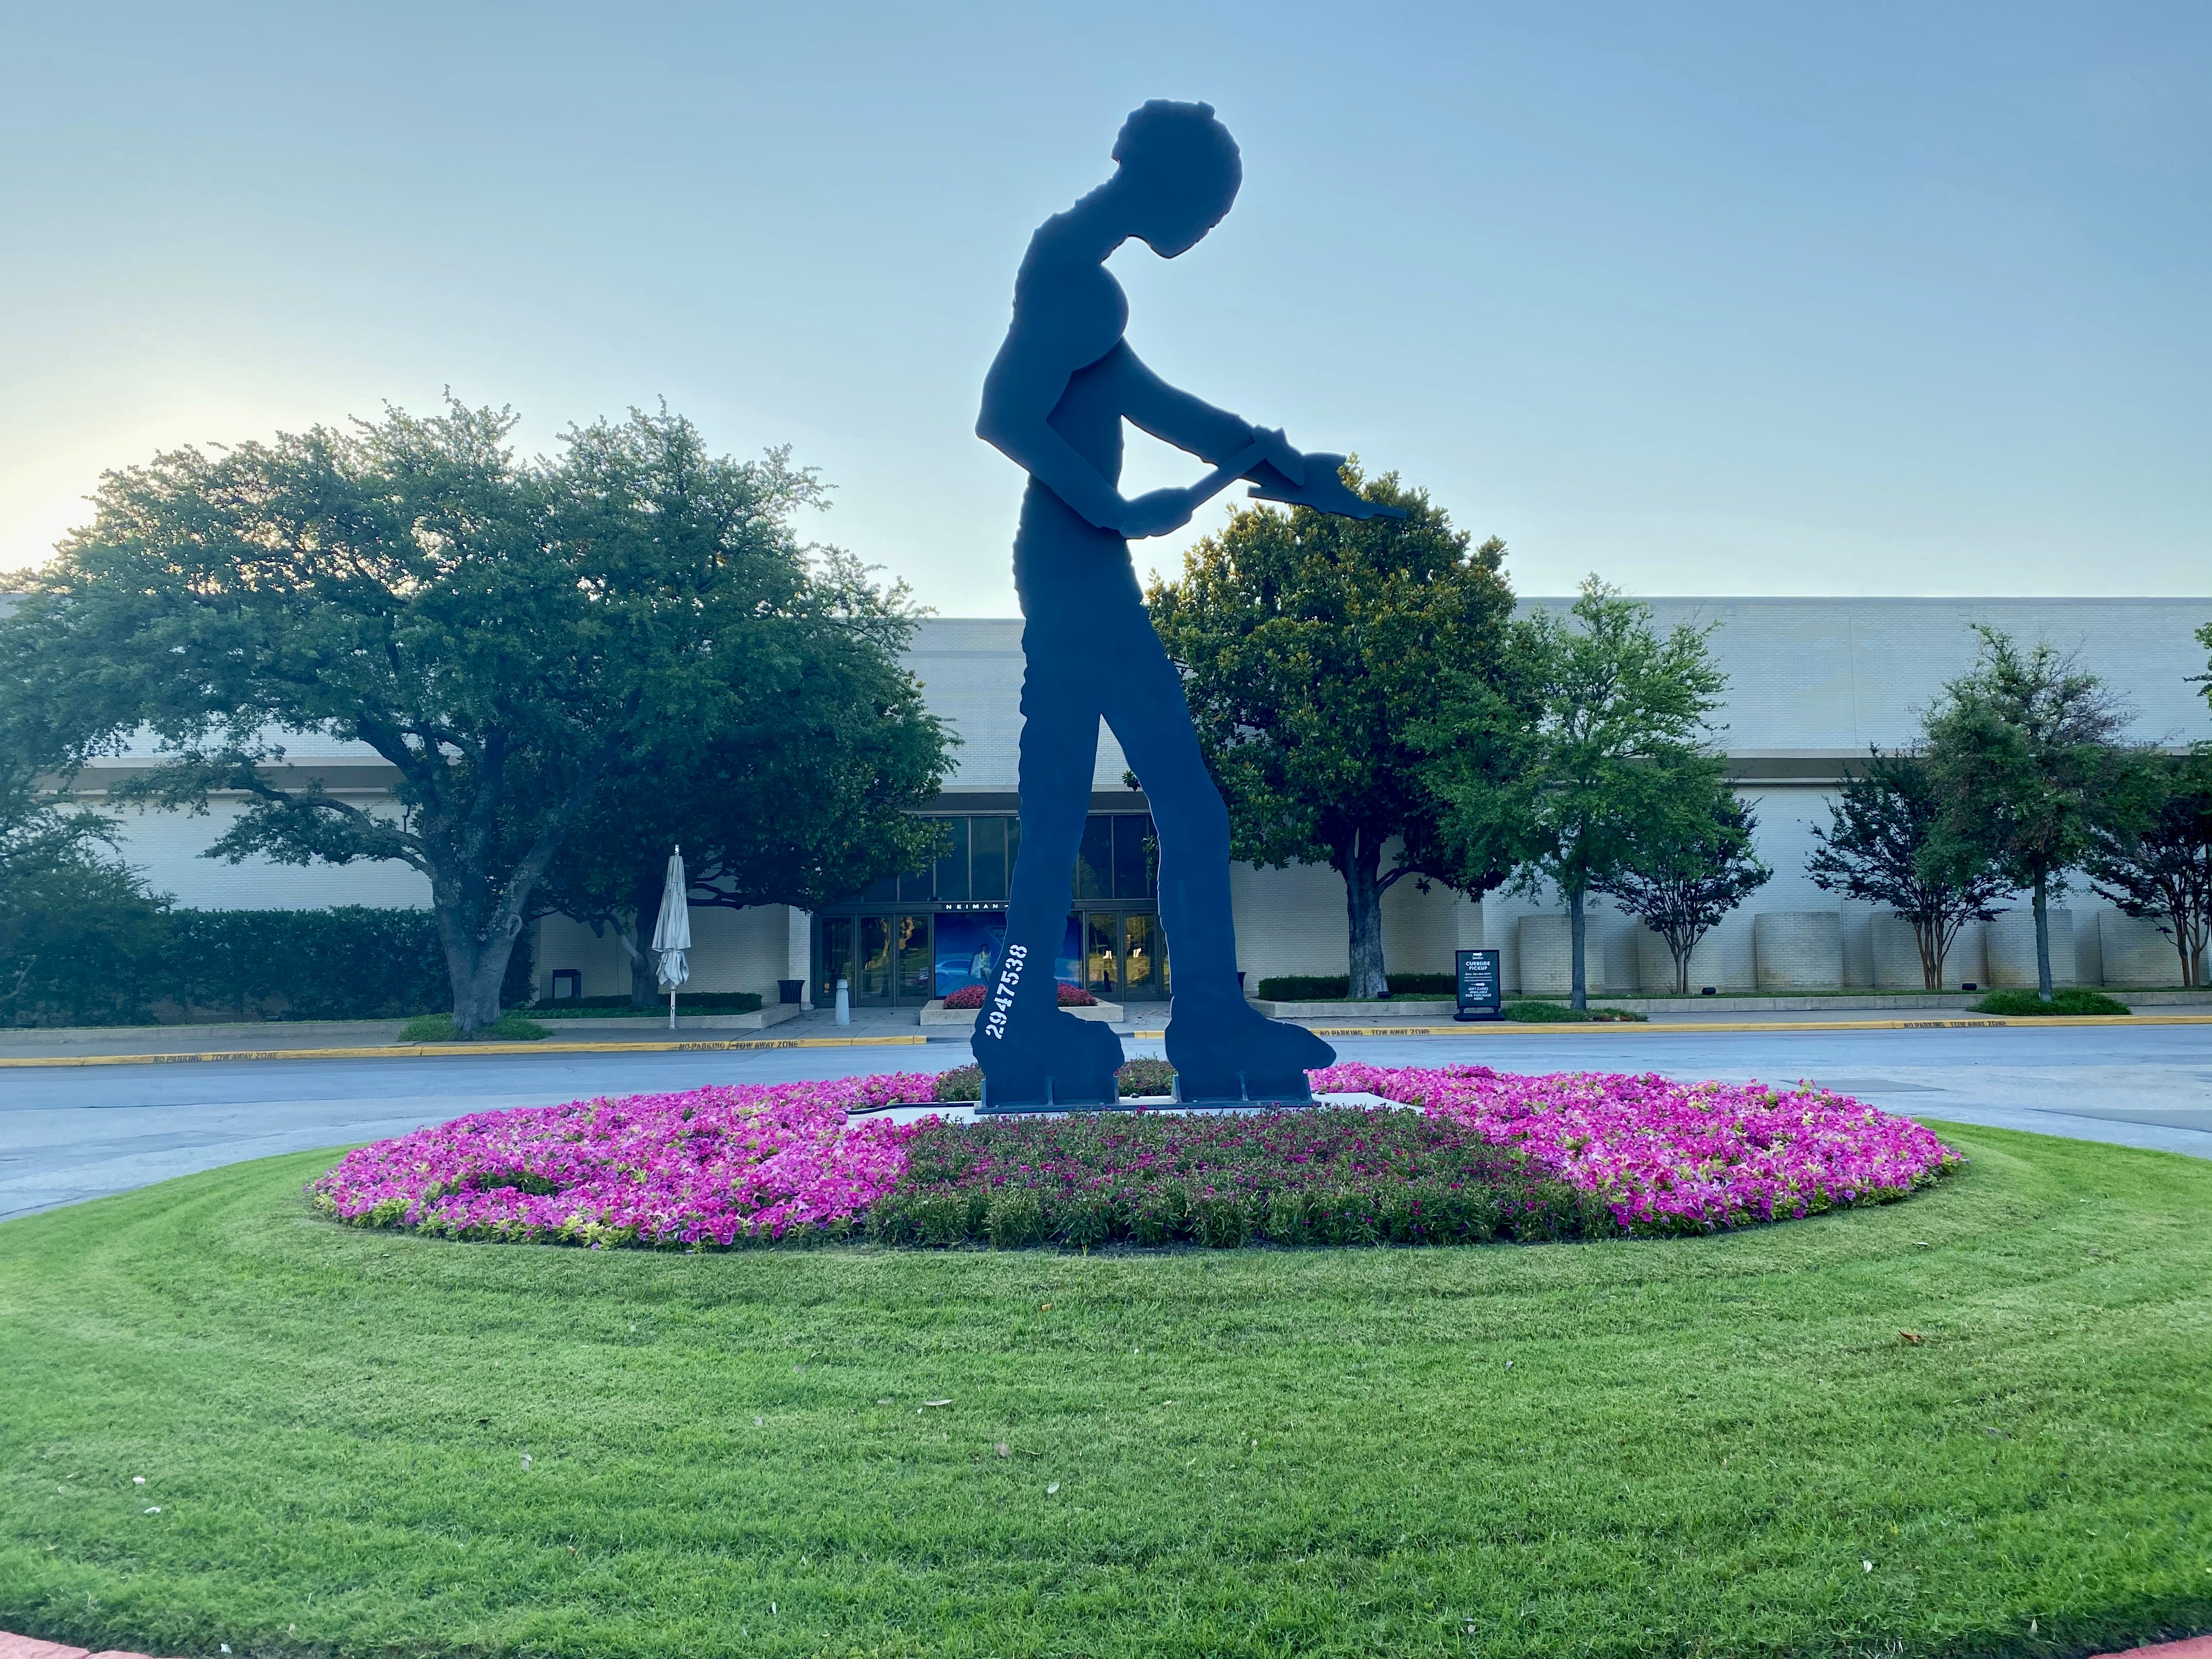 Sculpture at NorthPark Shopping Center in North Dallas, TX